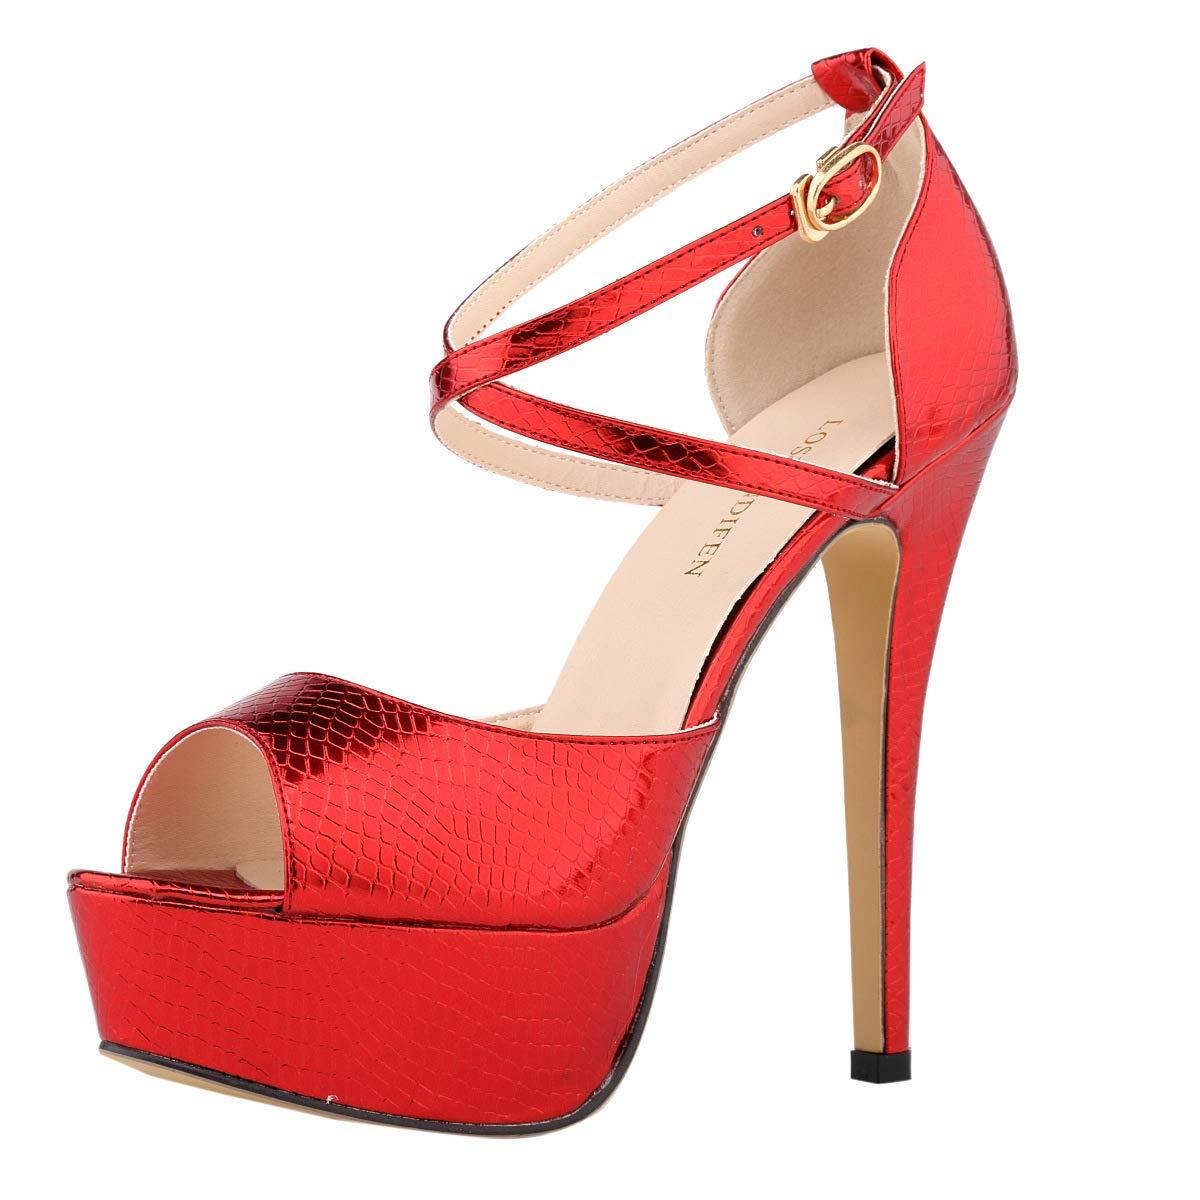 Red Women's Peep Toe Platform Stiletto High Heel Ankle Crisscross Strap Buckle Snap Dress Party Heeled Sandals